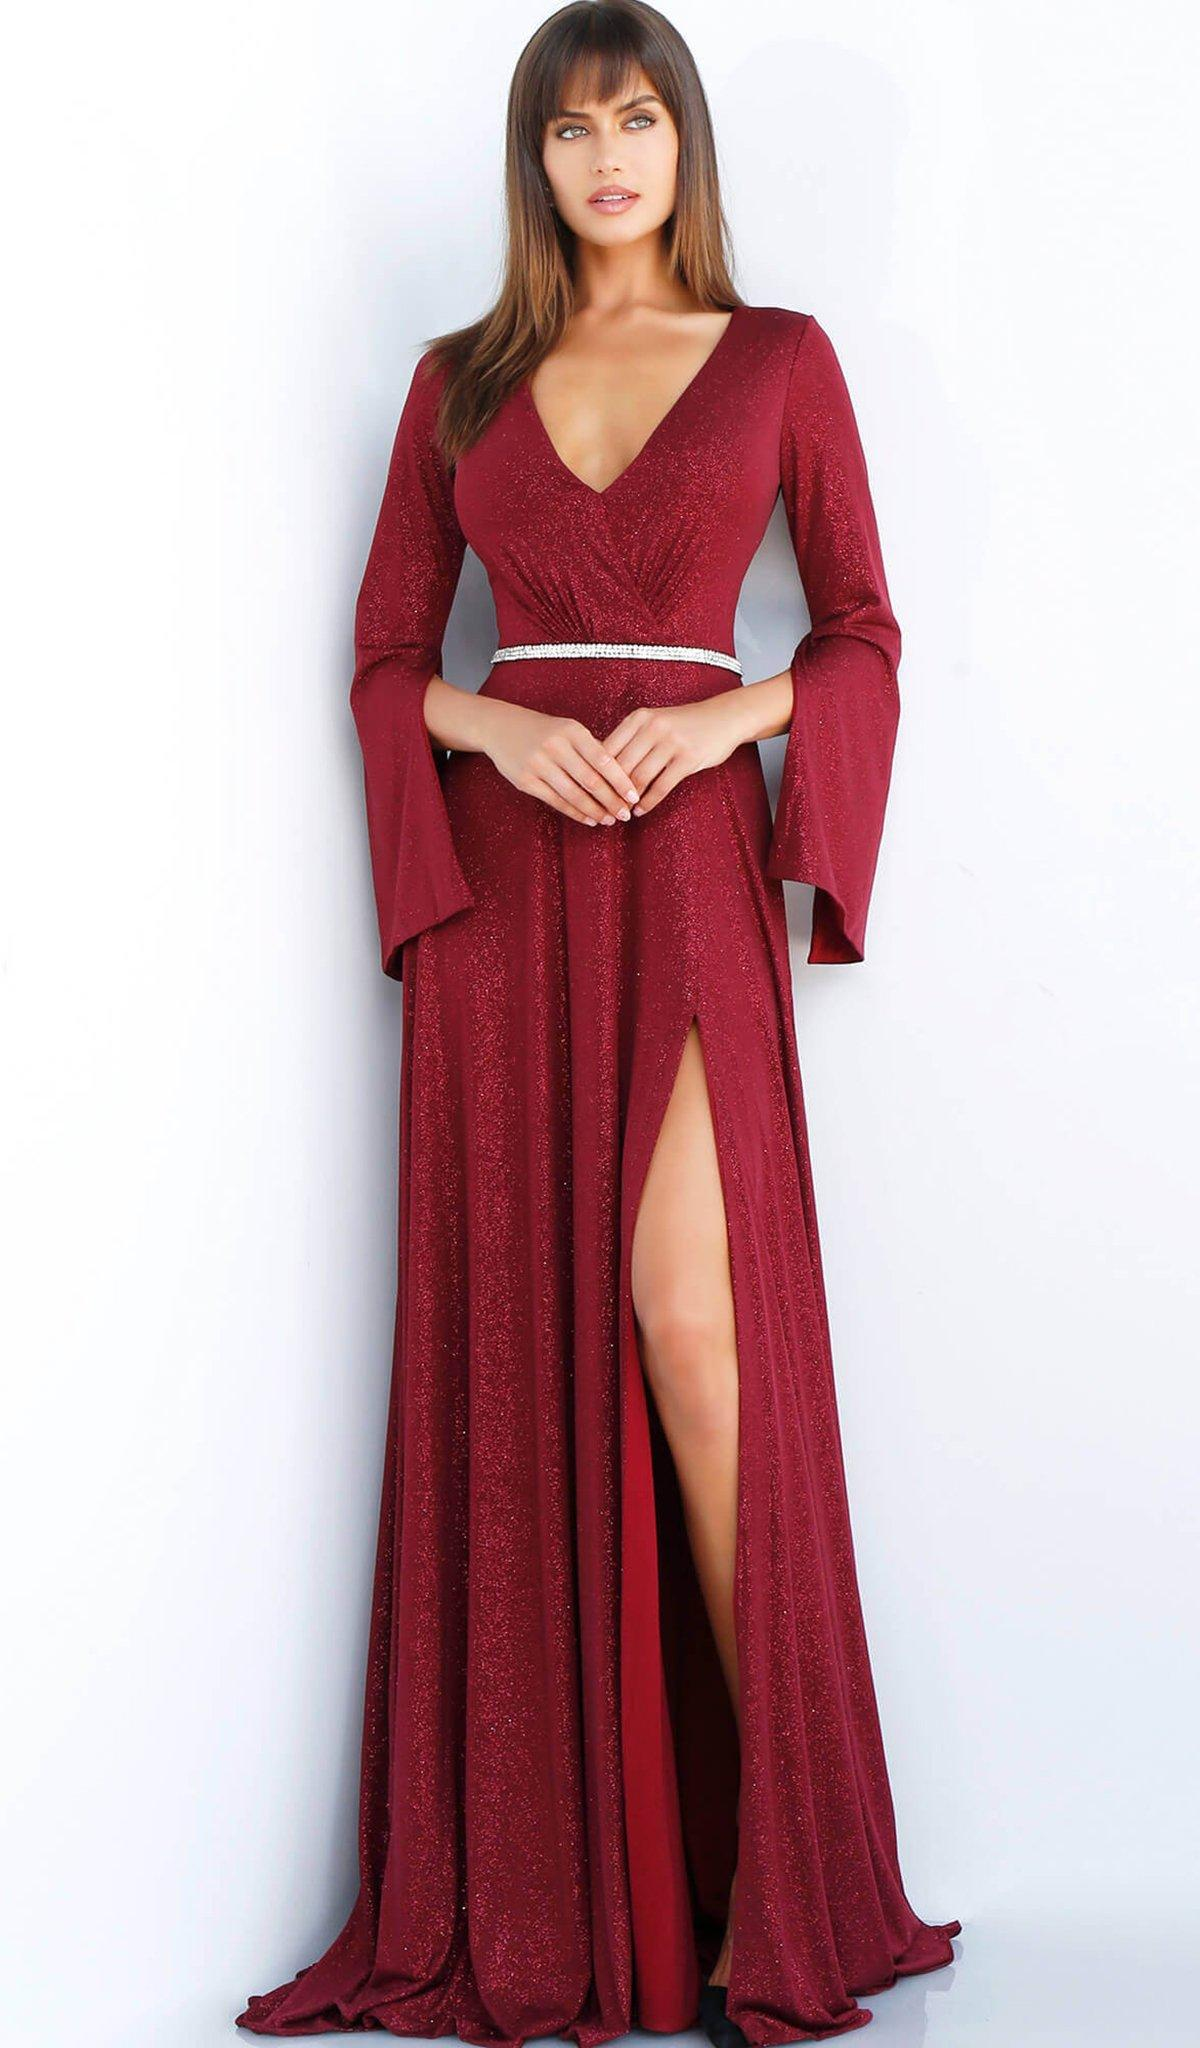 69275144071 Lyst - Jovani 63124 Split Long Sleeve Glitter High Slit Gown in Red